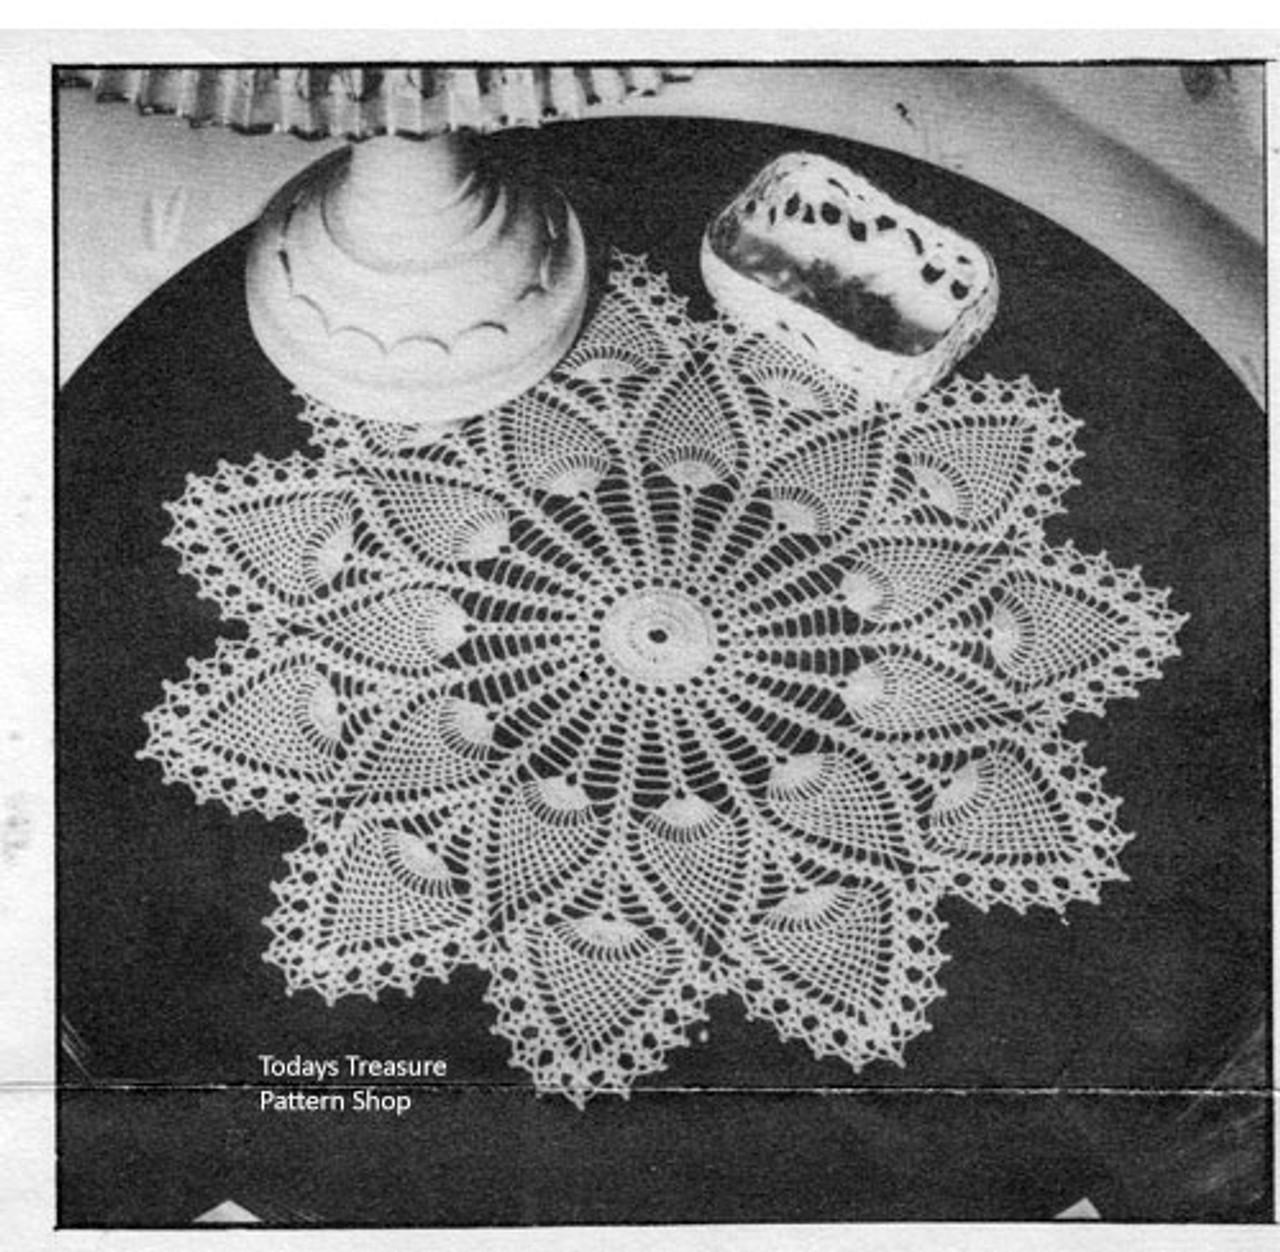 Vintage Pineapple Wheel Crocheted Doily Pattern No 7275